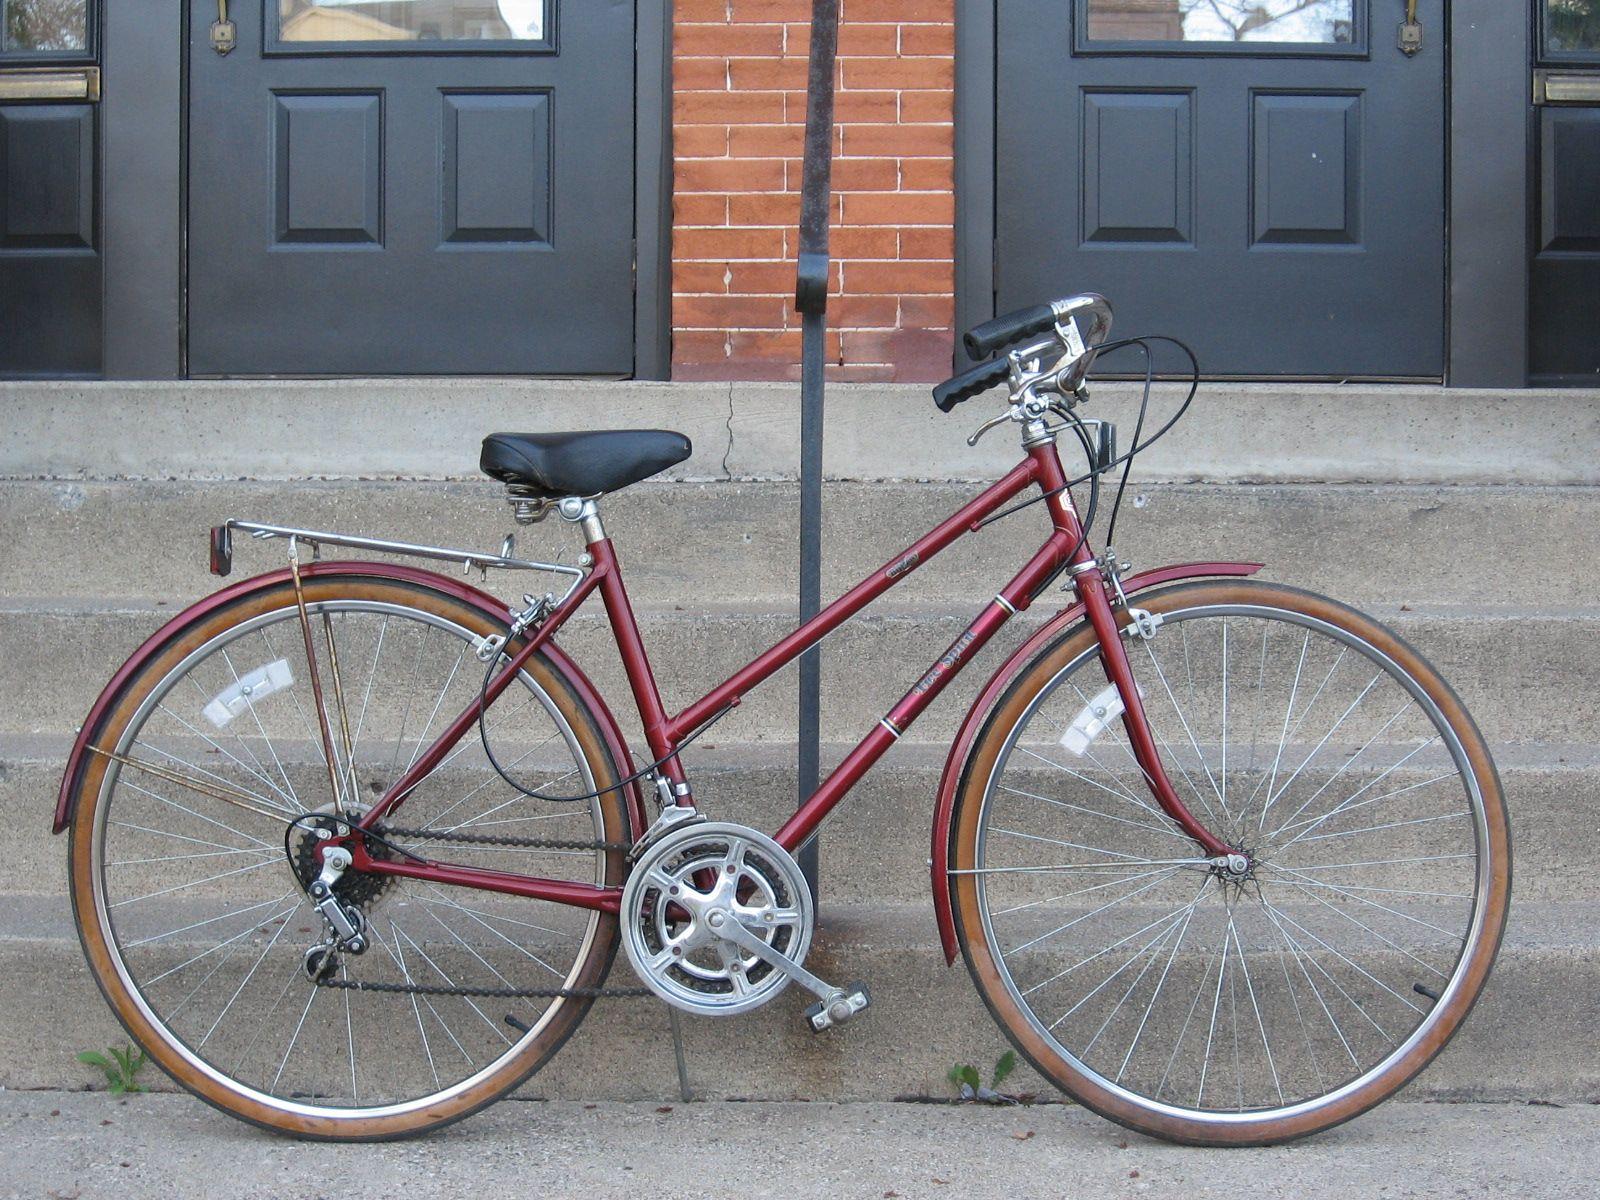 My Old Bike A Brittany Free Spirit Miss It Things I Like